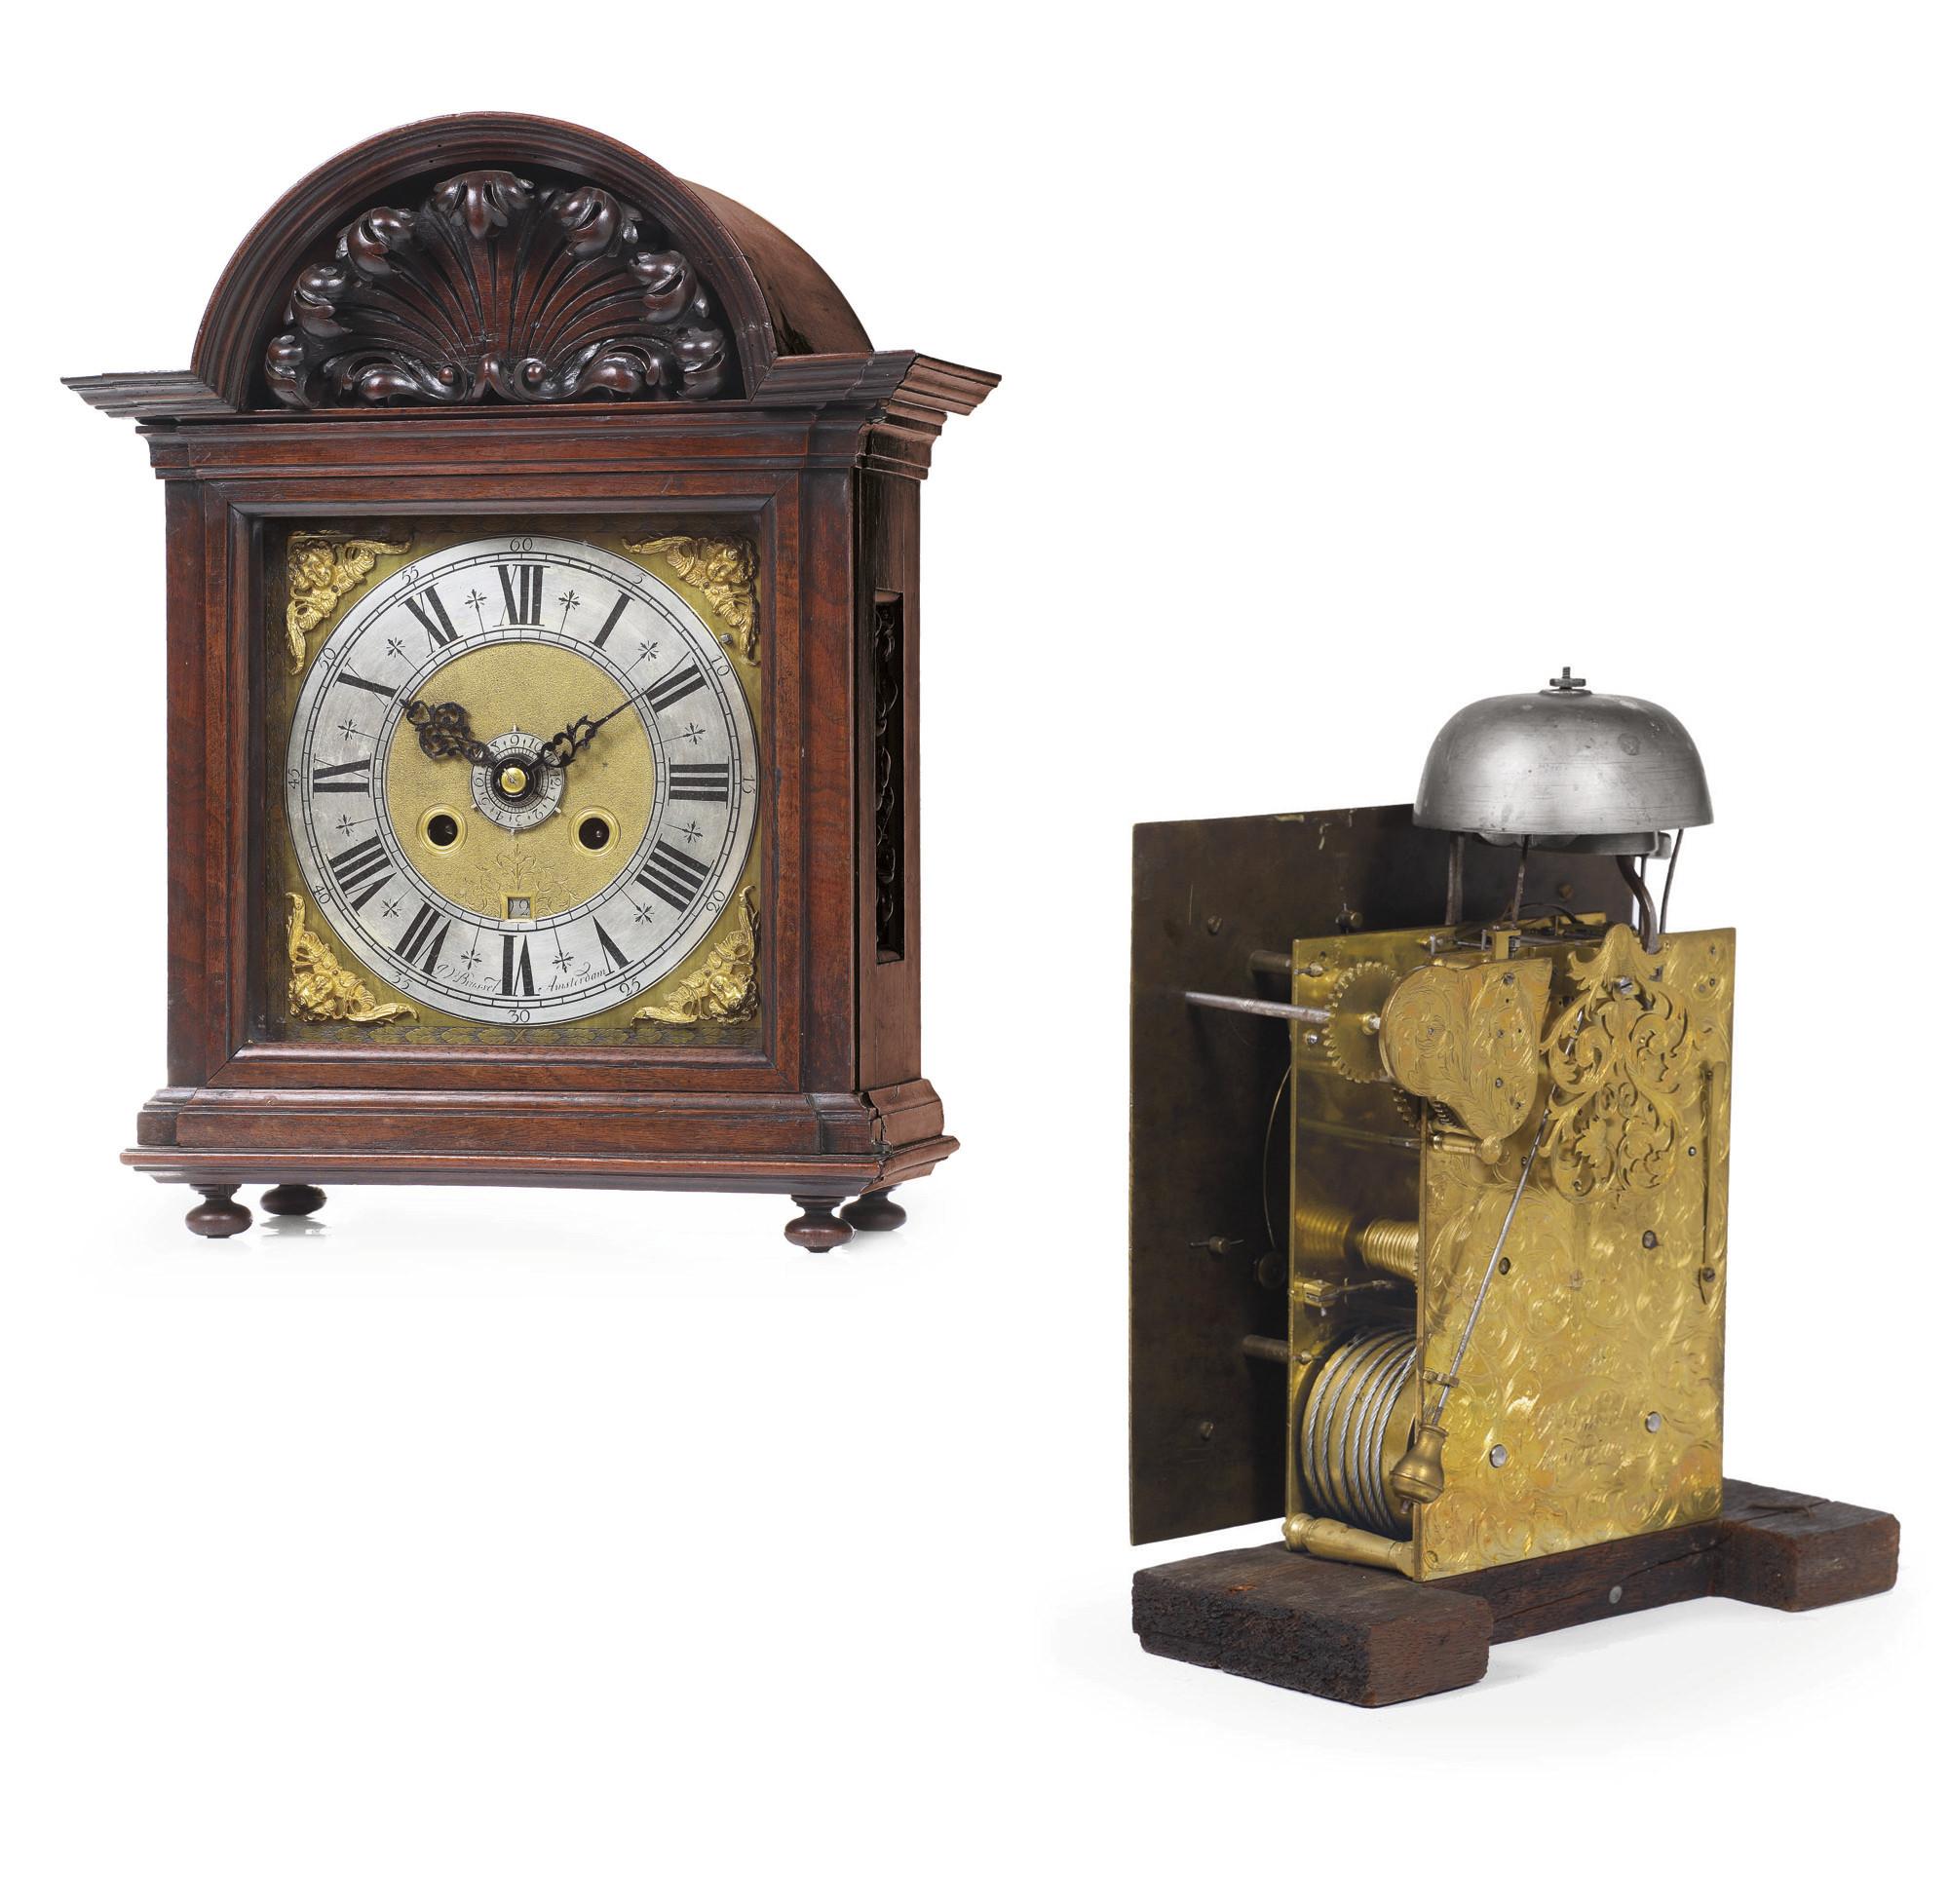 A DUTCH WALNUT STRIKING TABLE CLOCK WITH ALARM